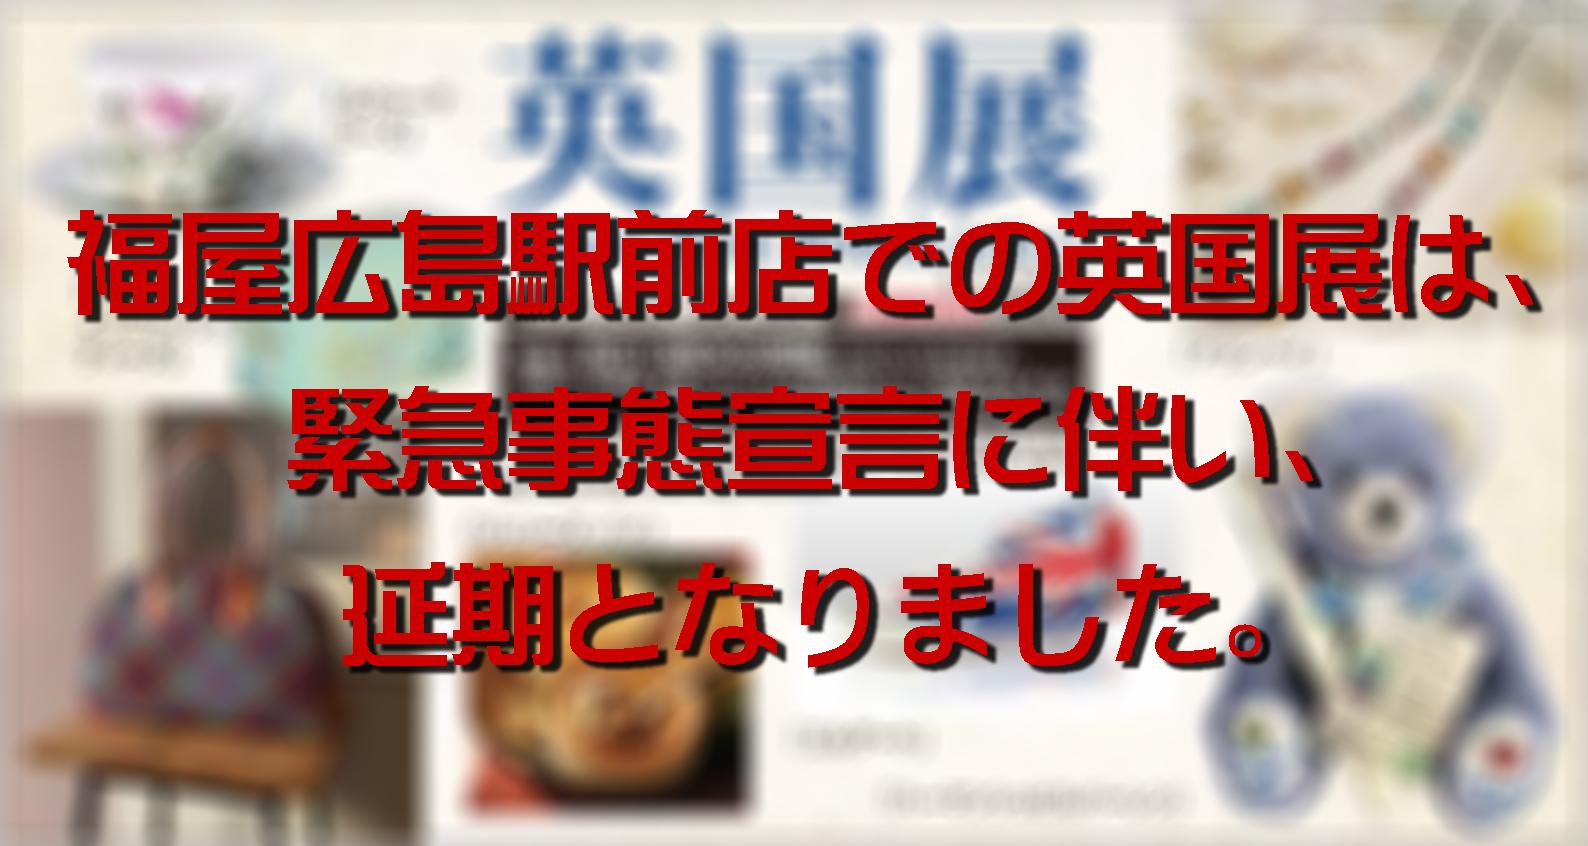 福屋広島駅前店での英国展は延期!!!